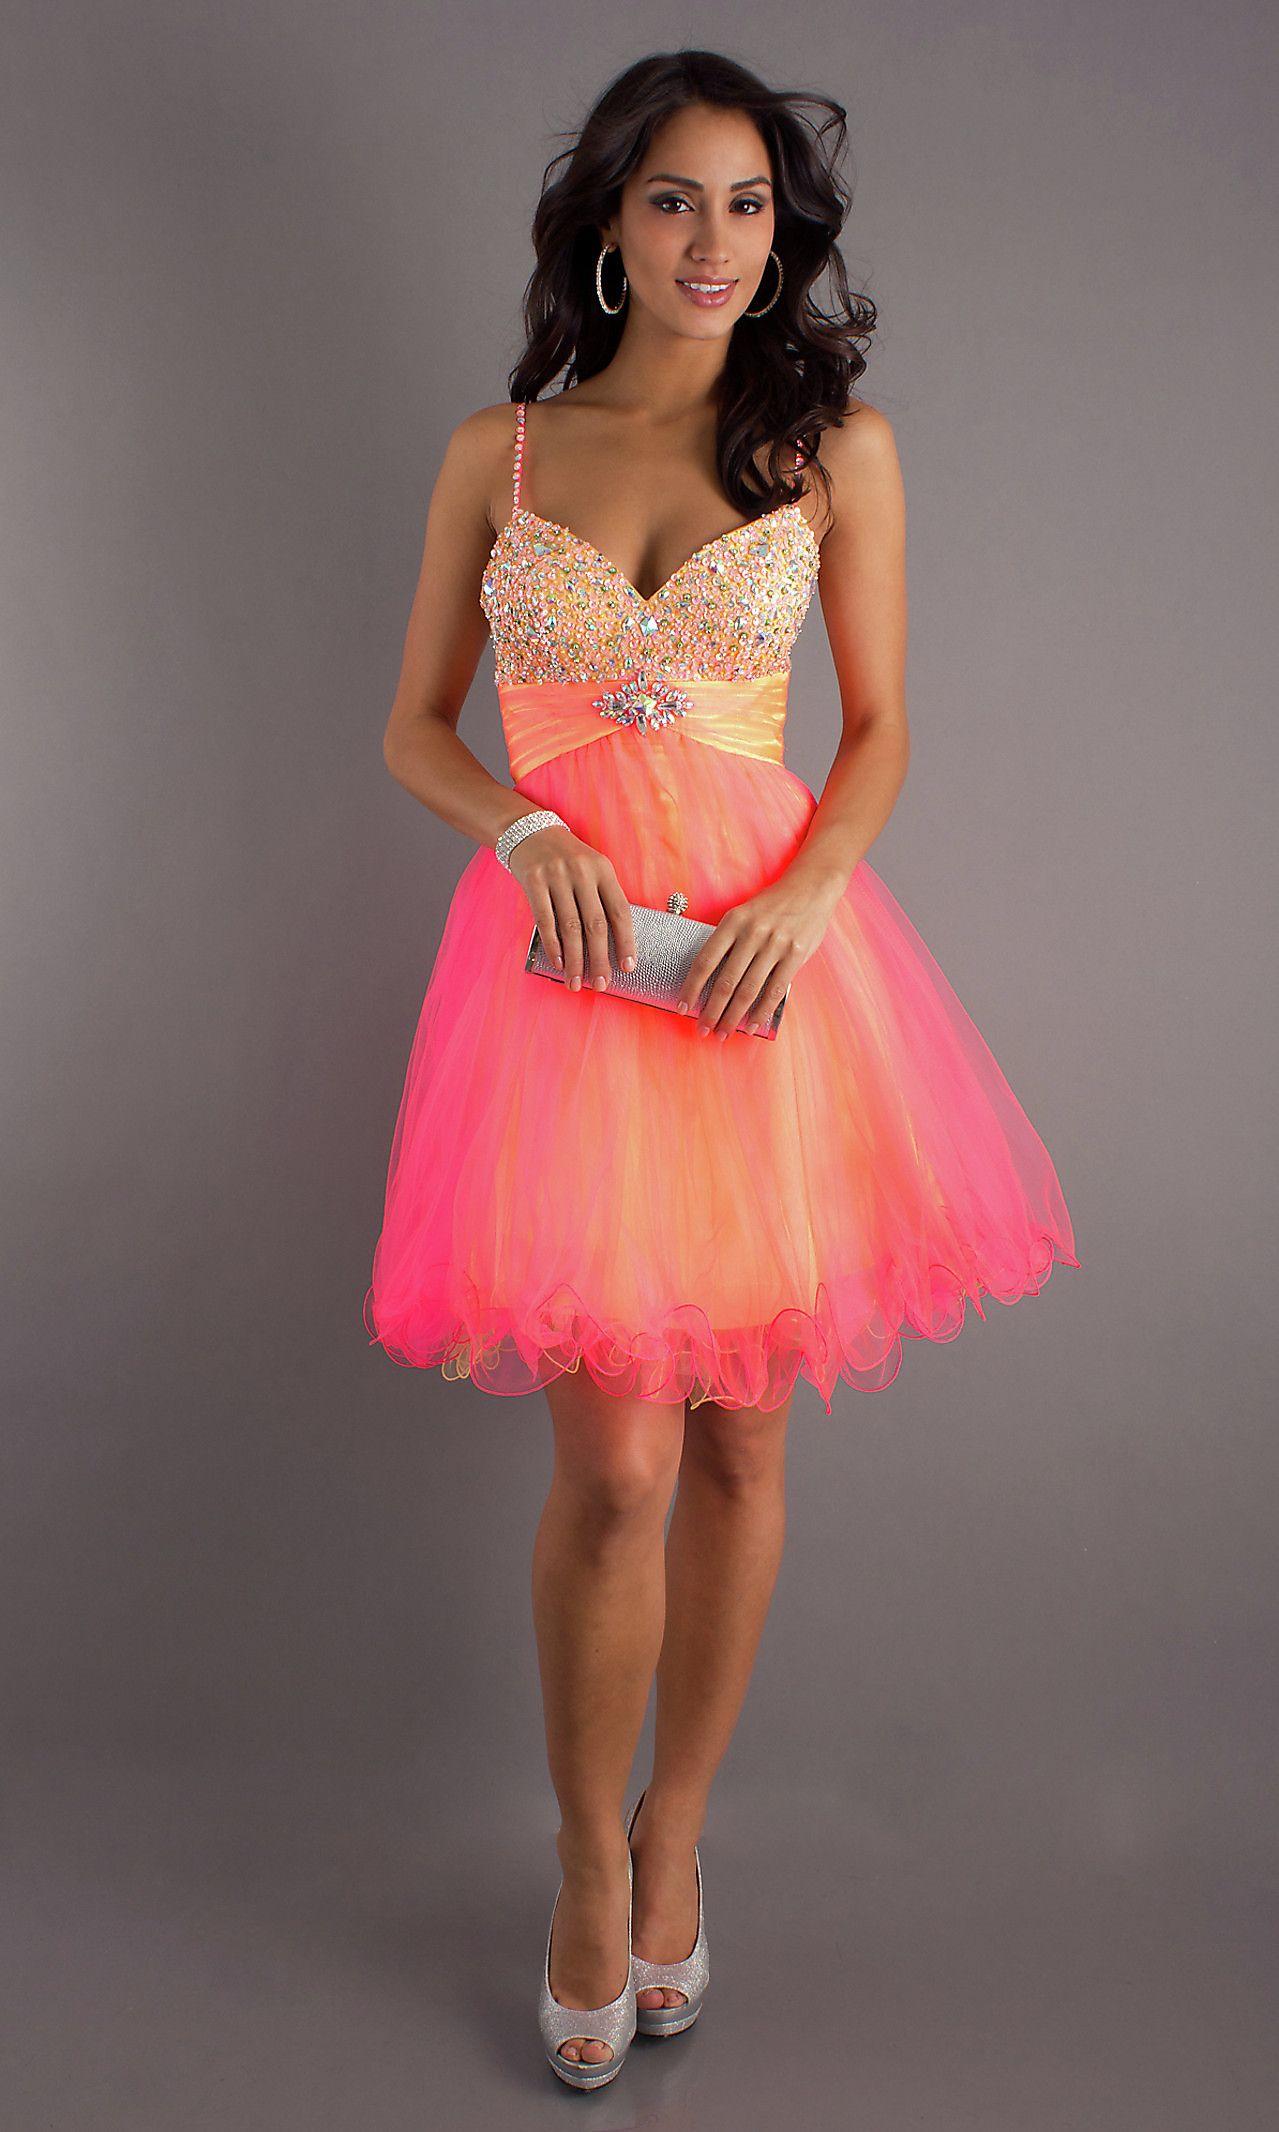 Short hannah s prom dress party dresses prom dresses simply